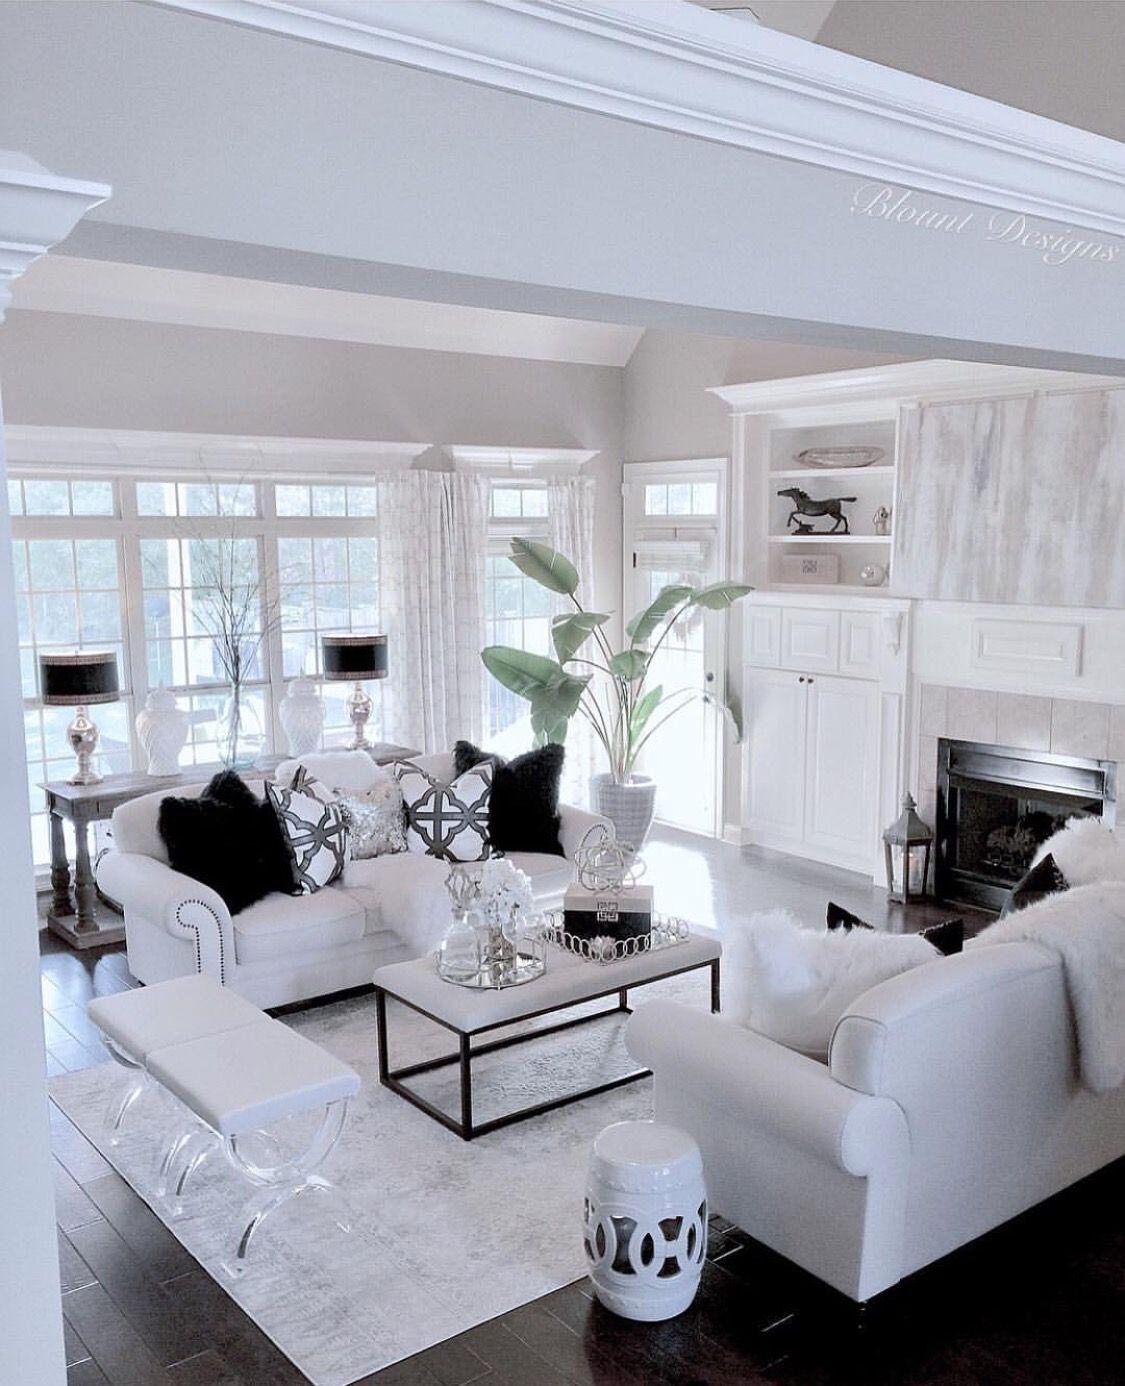 Bright White Home of Deborah Blount | Pinterest | Dear friend ...